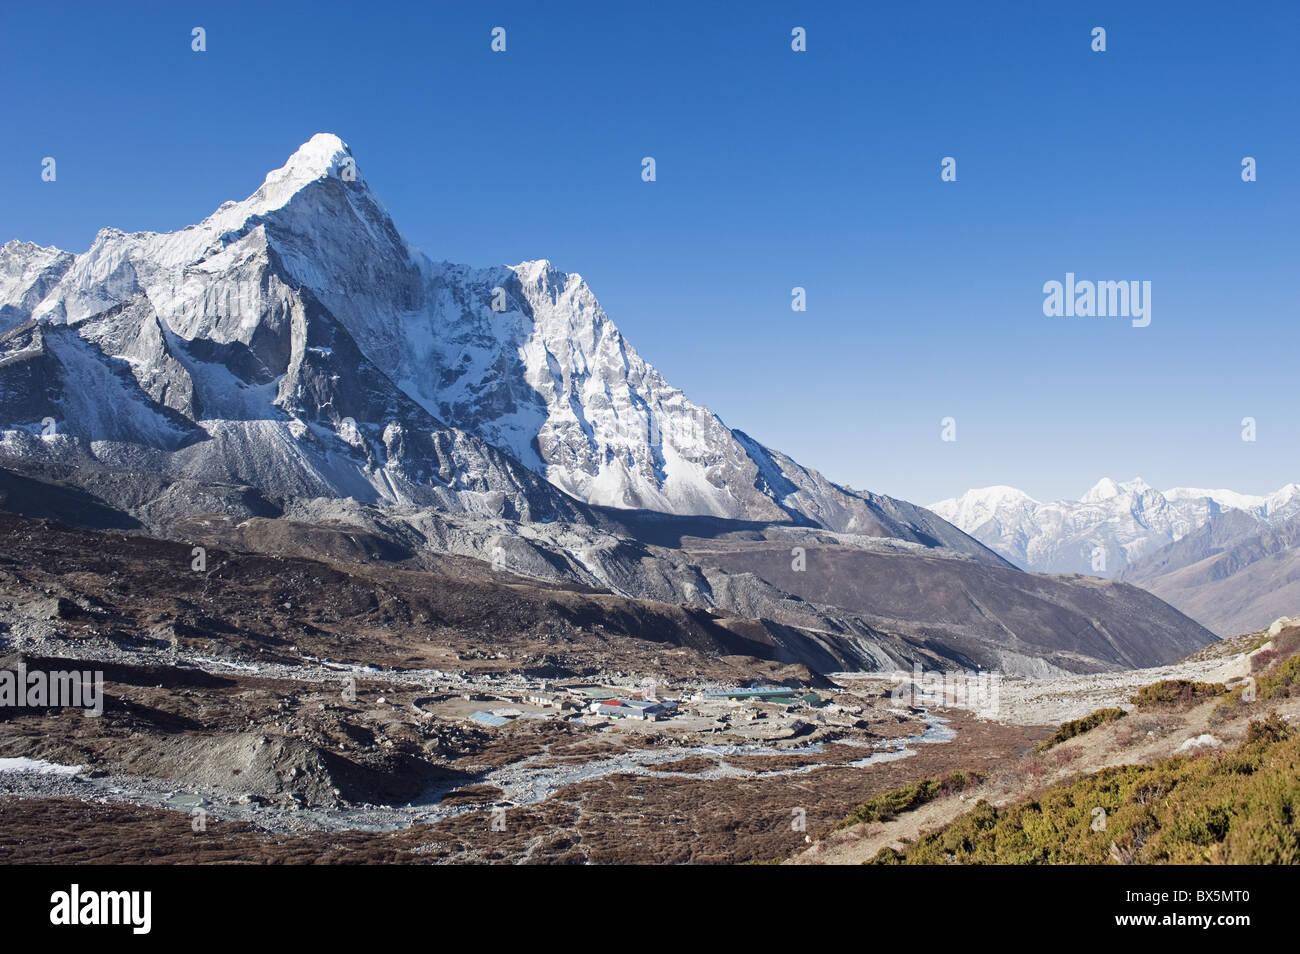 Chukhung resort and Ama Dablam, 6812m, Solu Khumbu Everest Region, Sagarmatha National Park, Himalayas, Nepal, Asia - Stock Image